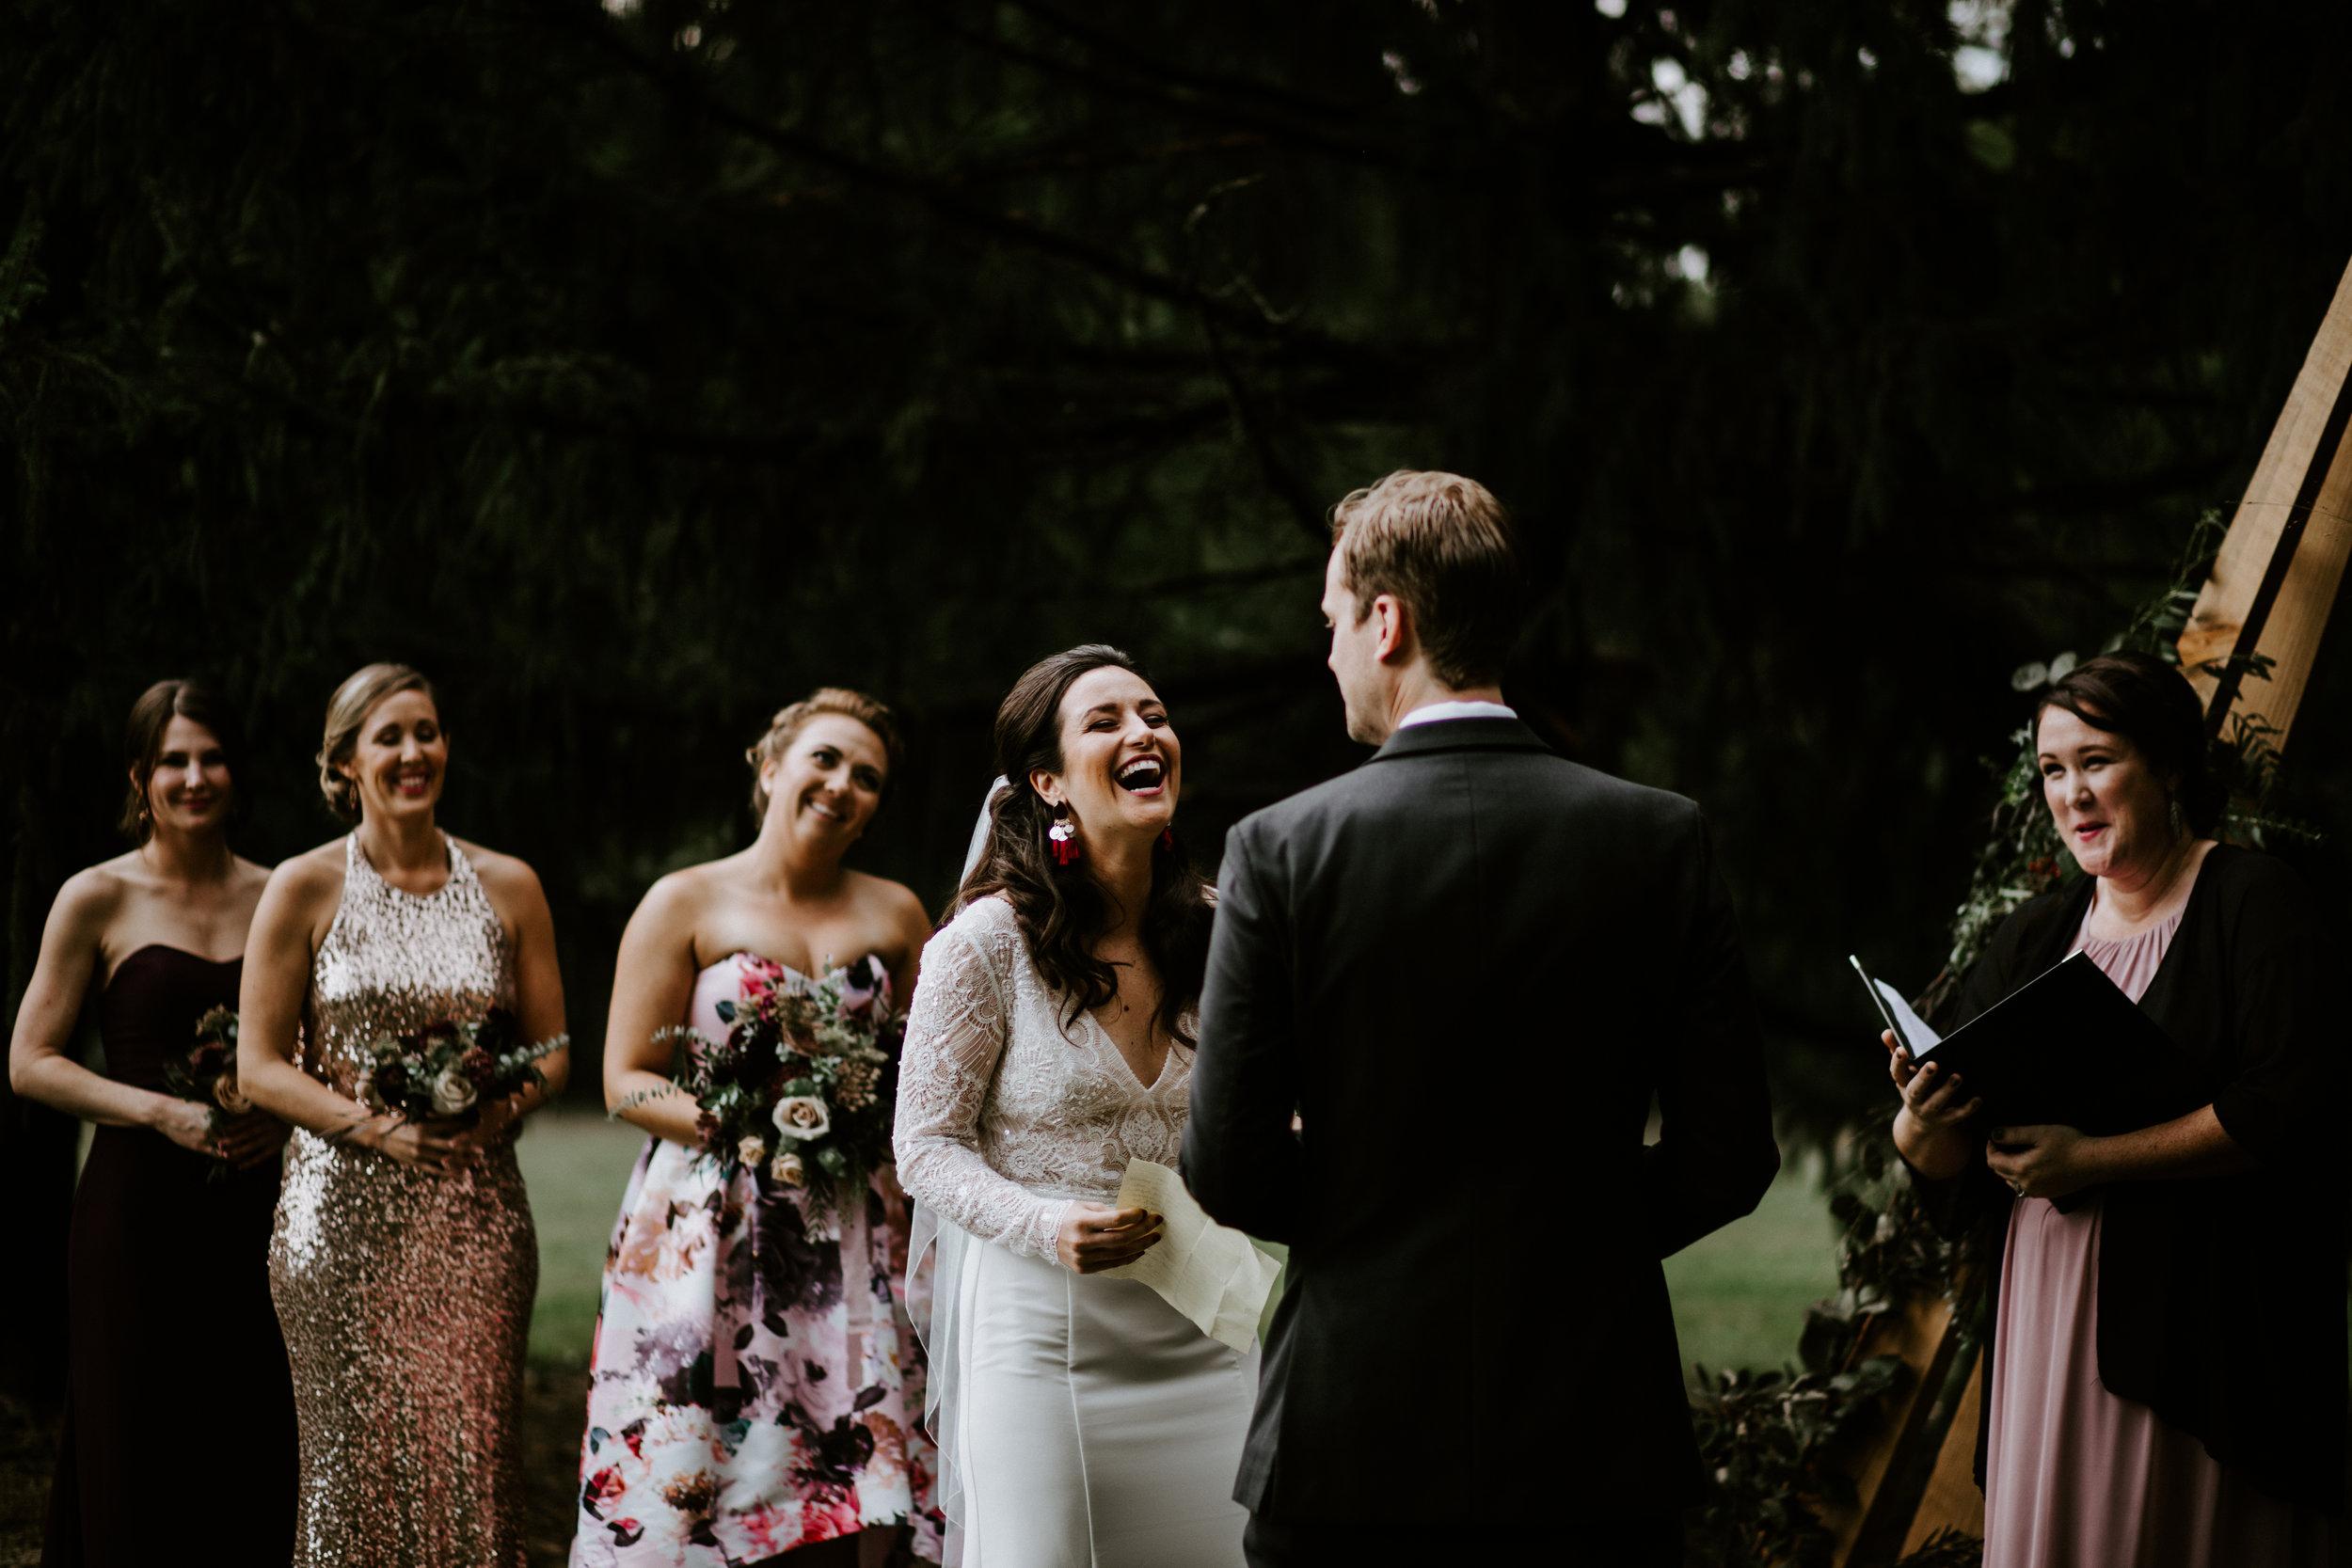 st-louis-missouri-wedding-photographer-tower-grove-park-sheldon-concert-hall-steph+phil-514.jpg